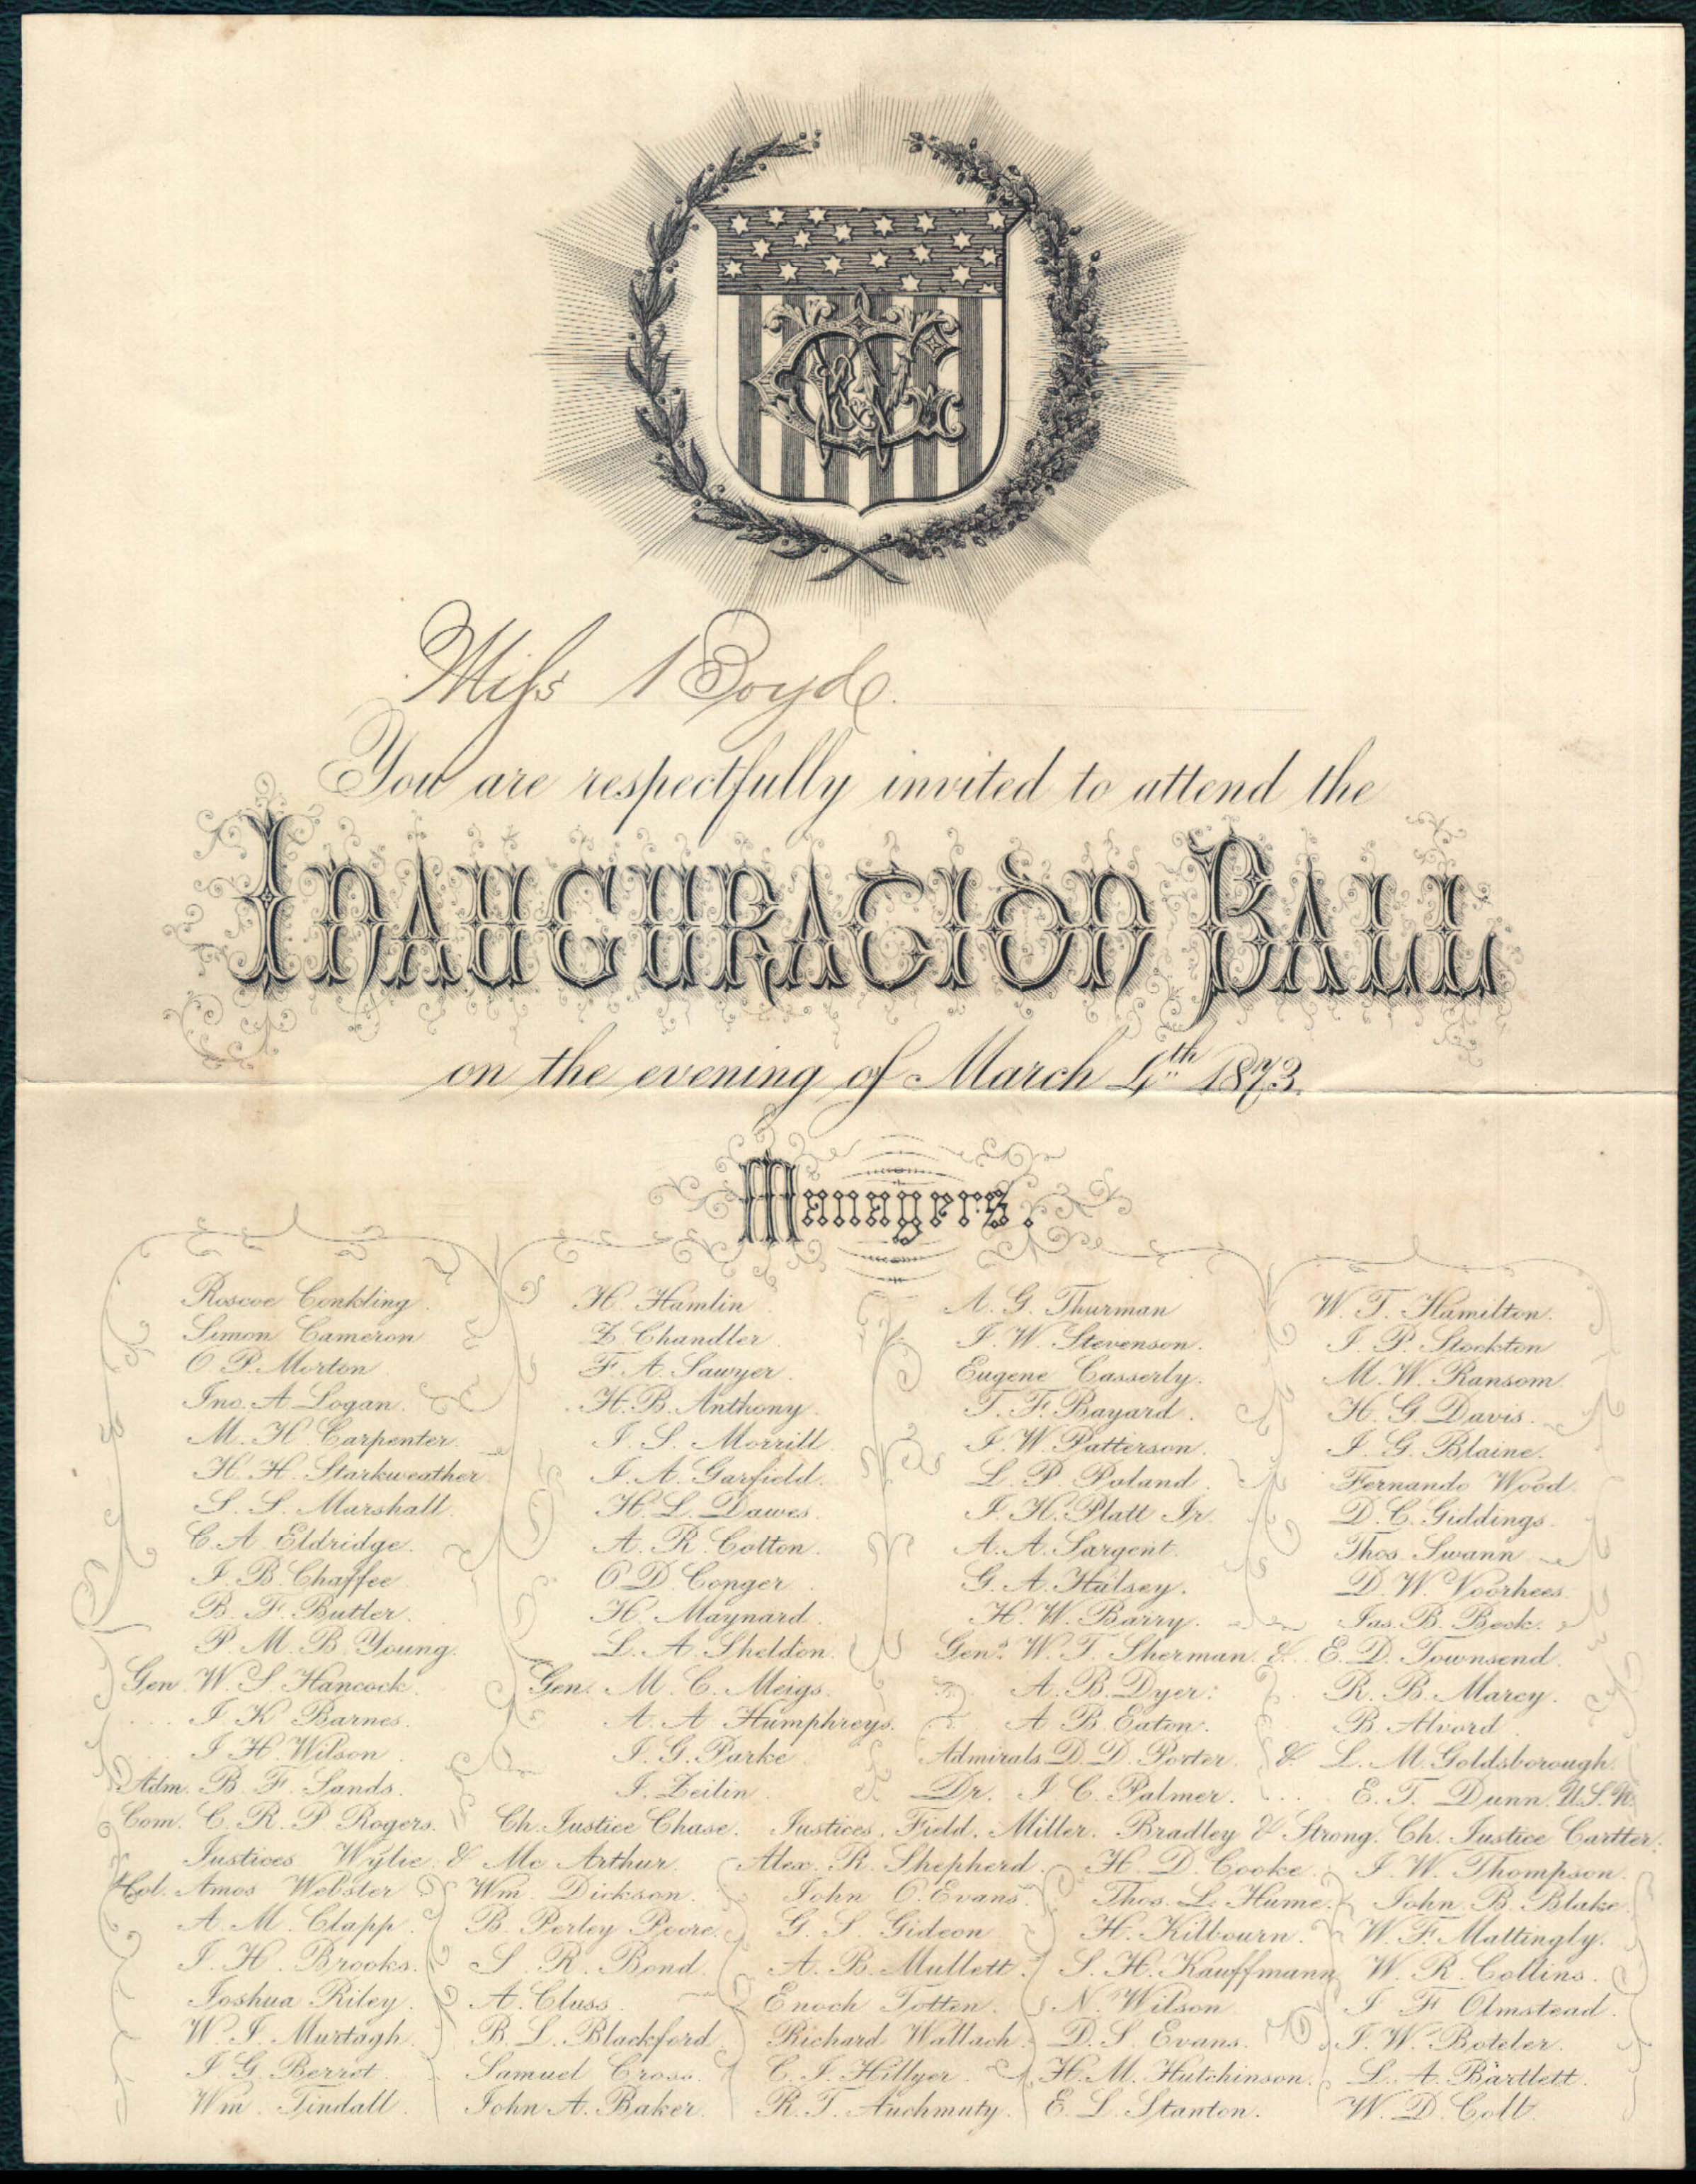 1873 Inaugural Ball invite.jpg